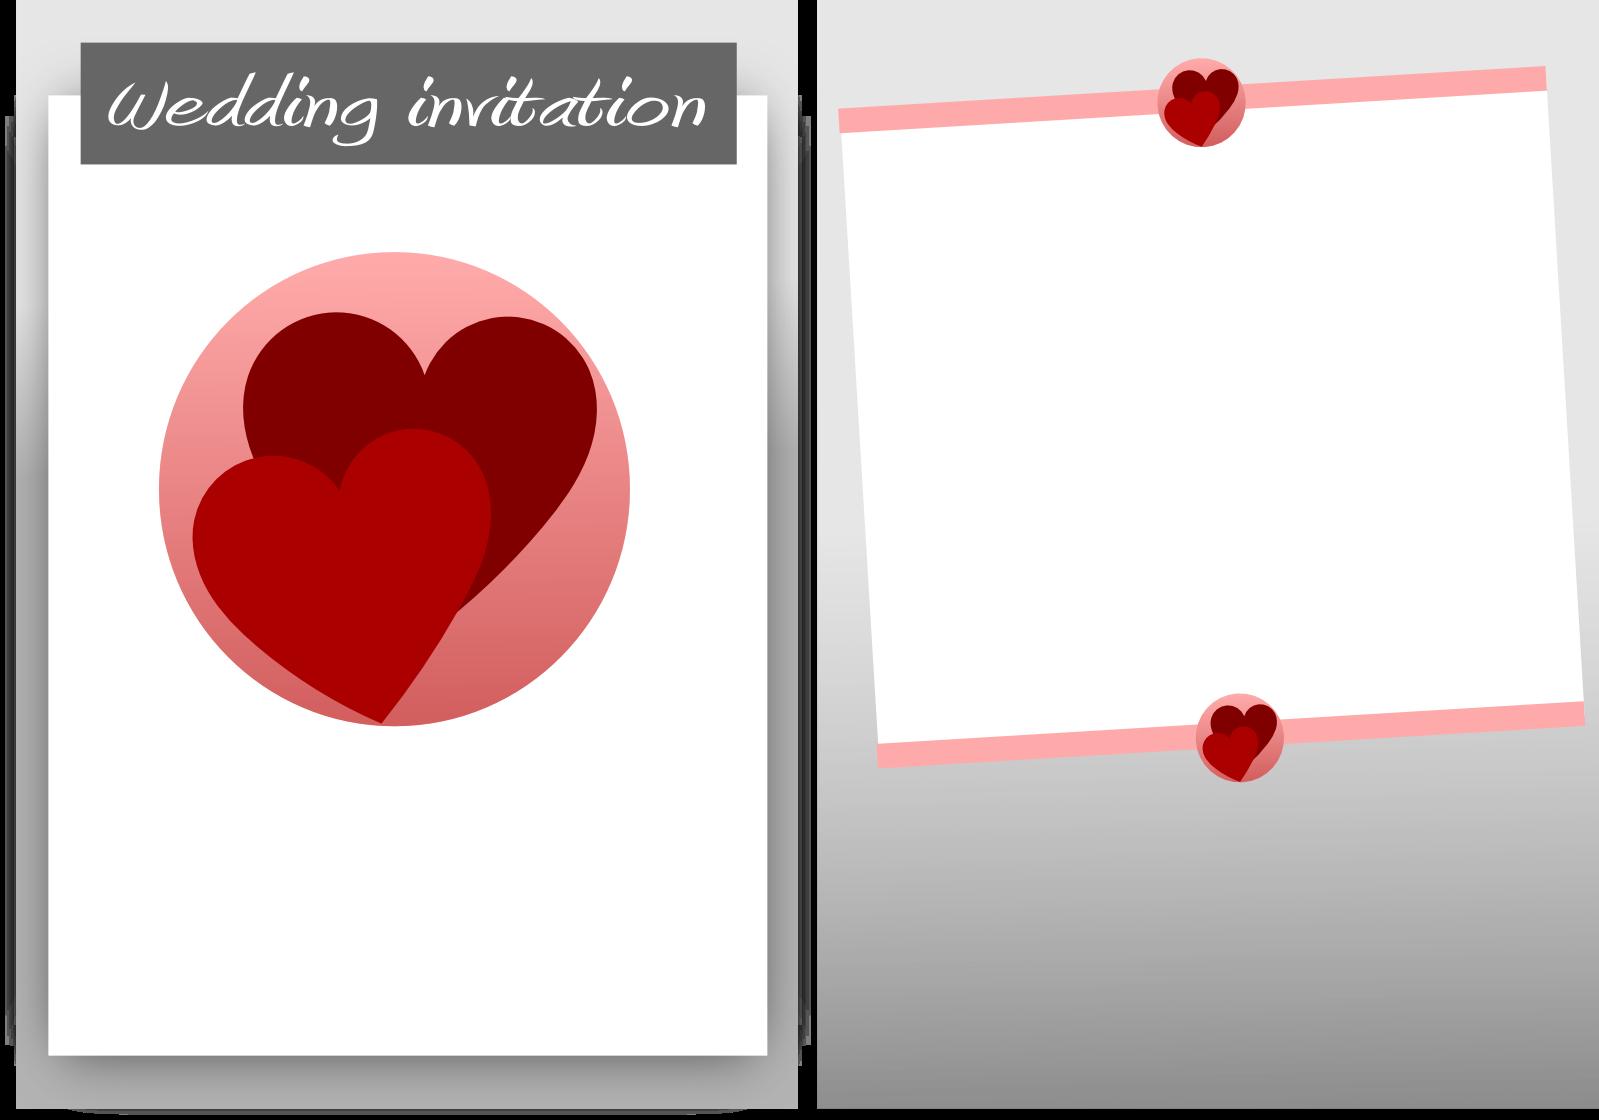 Blank wedding card design png file